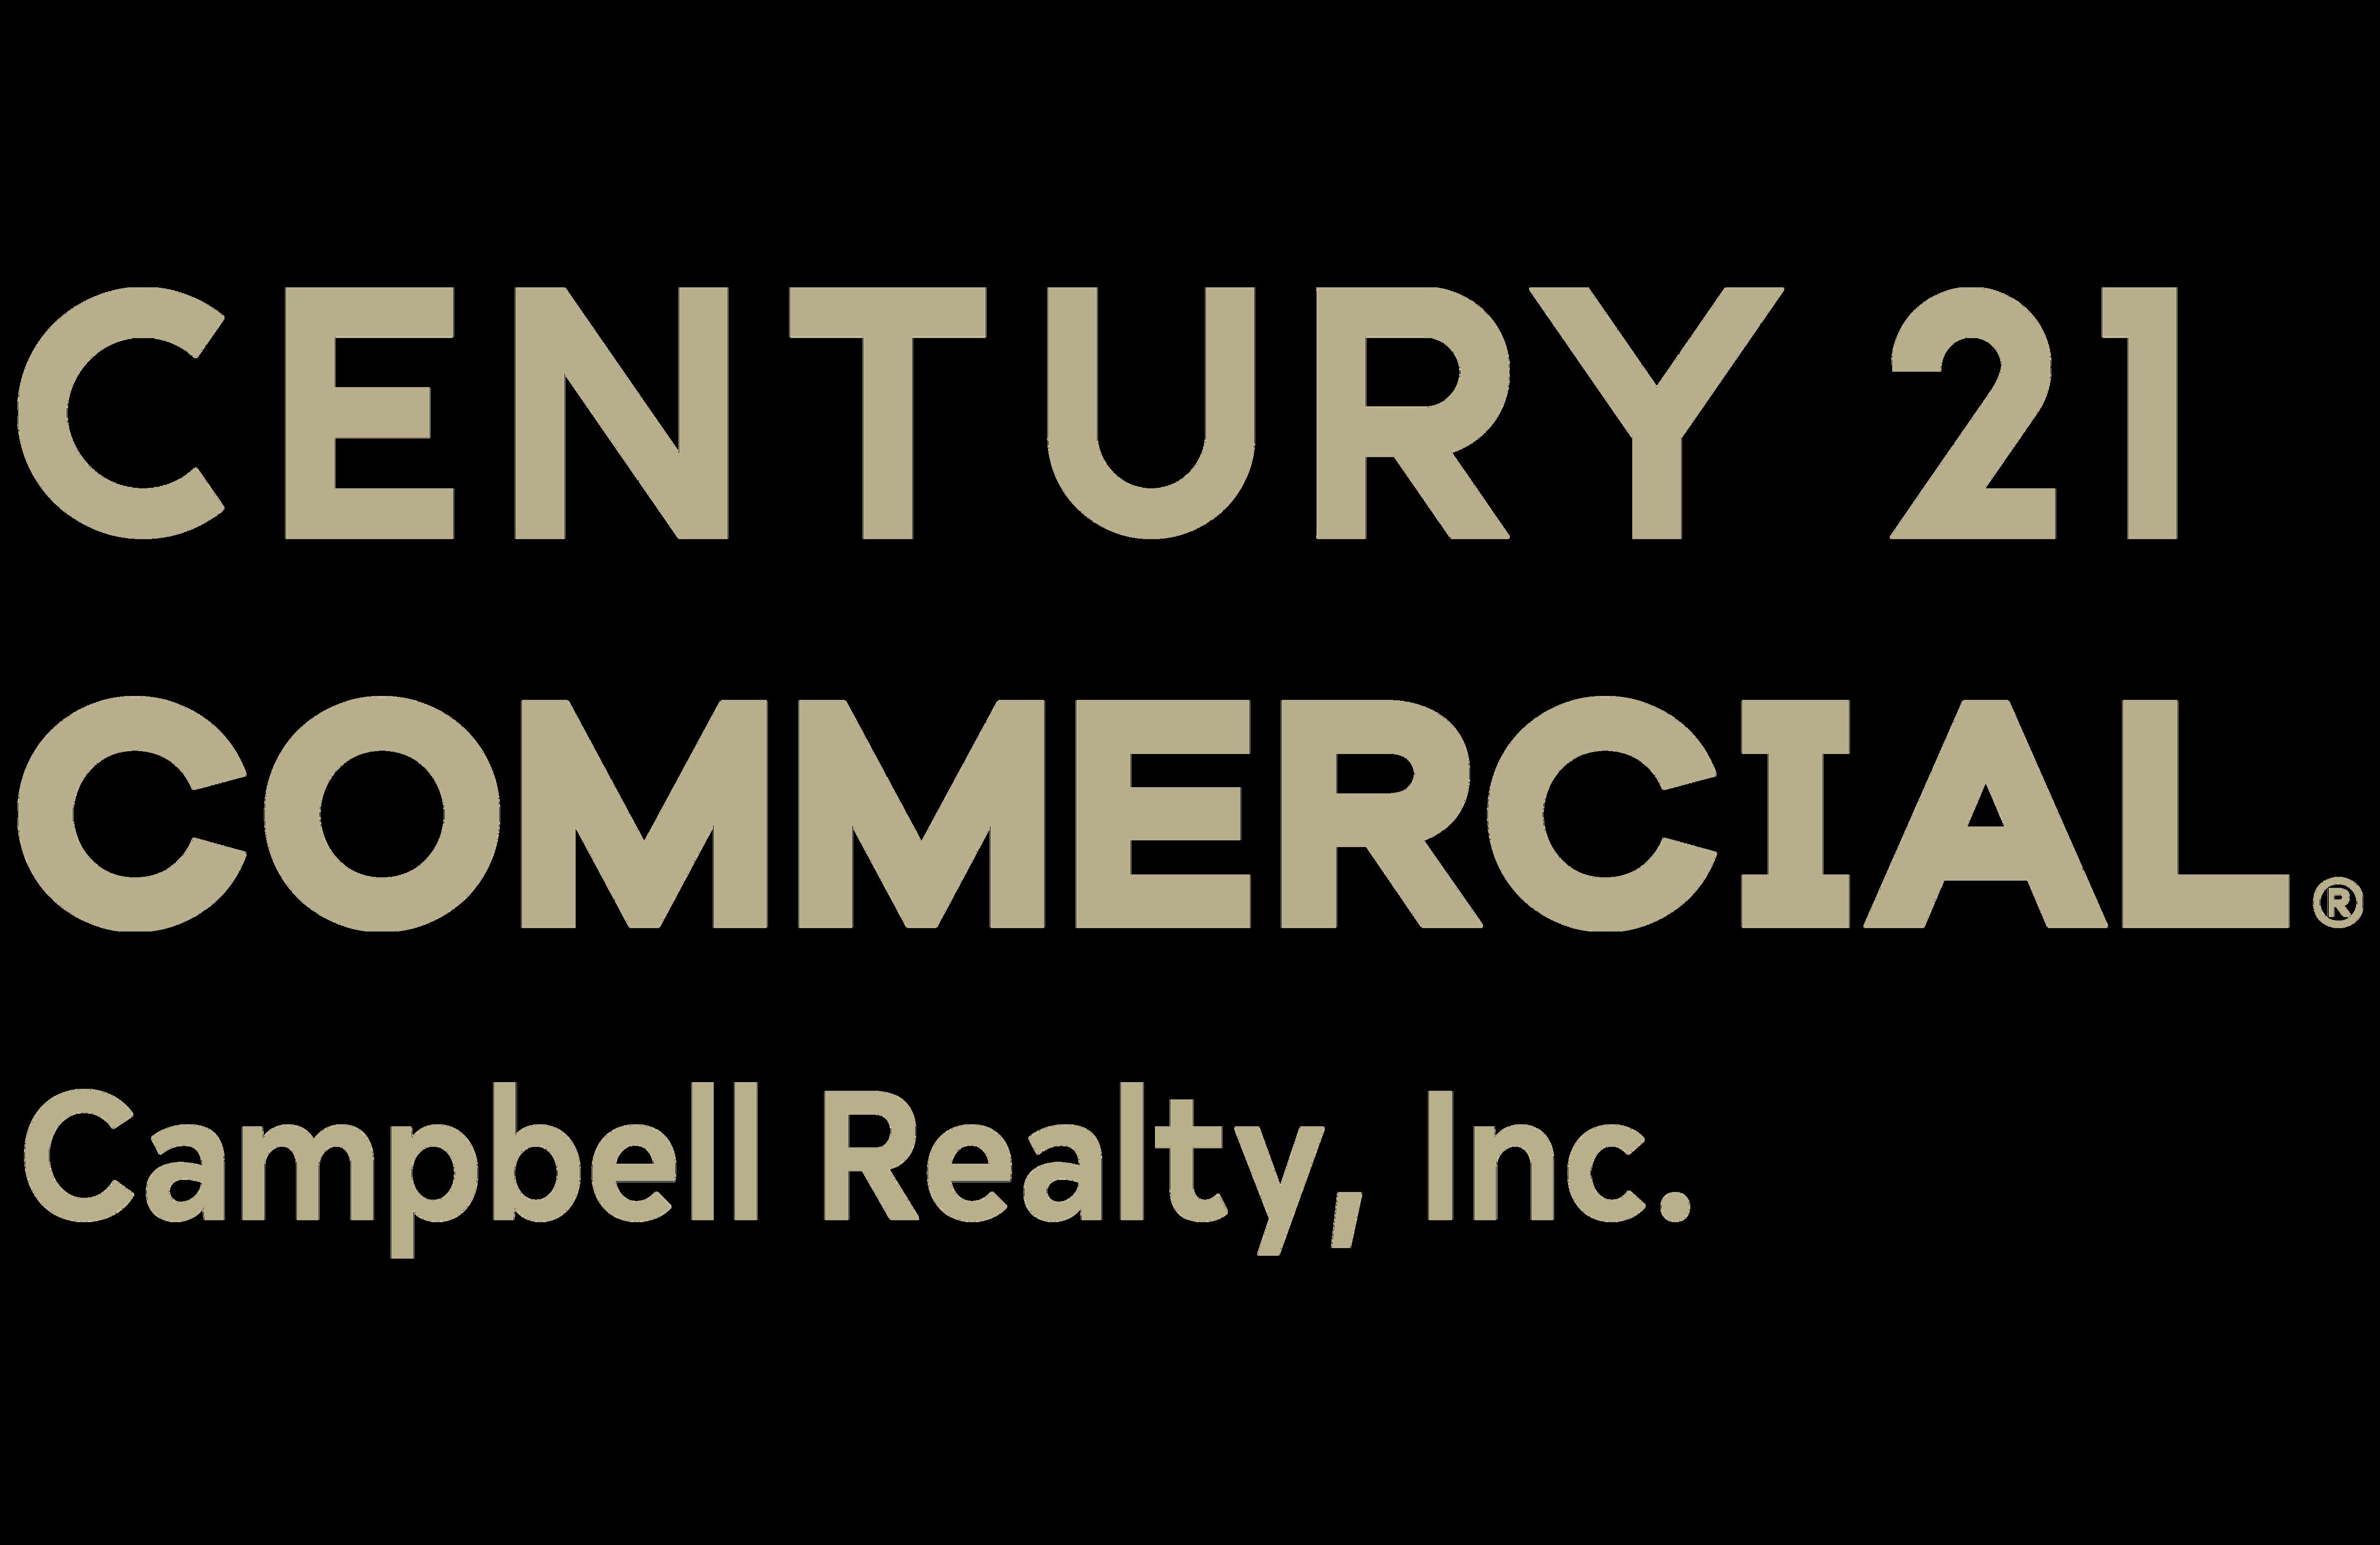 John Allen Eberhardt of CENTURY 21 Campbell Realty, Inc. logo